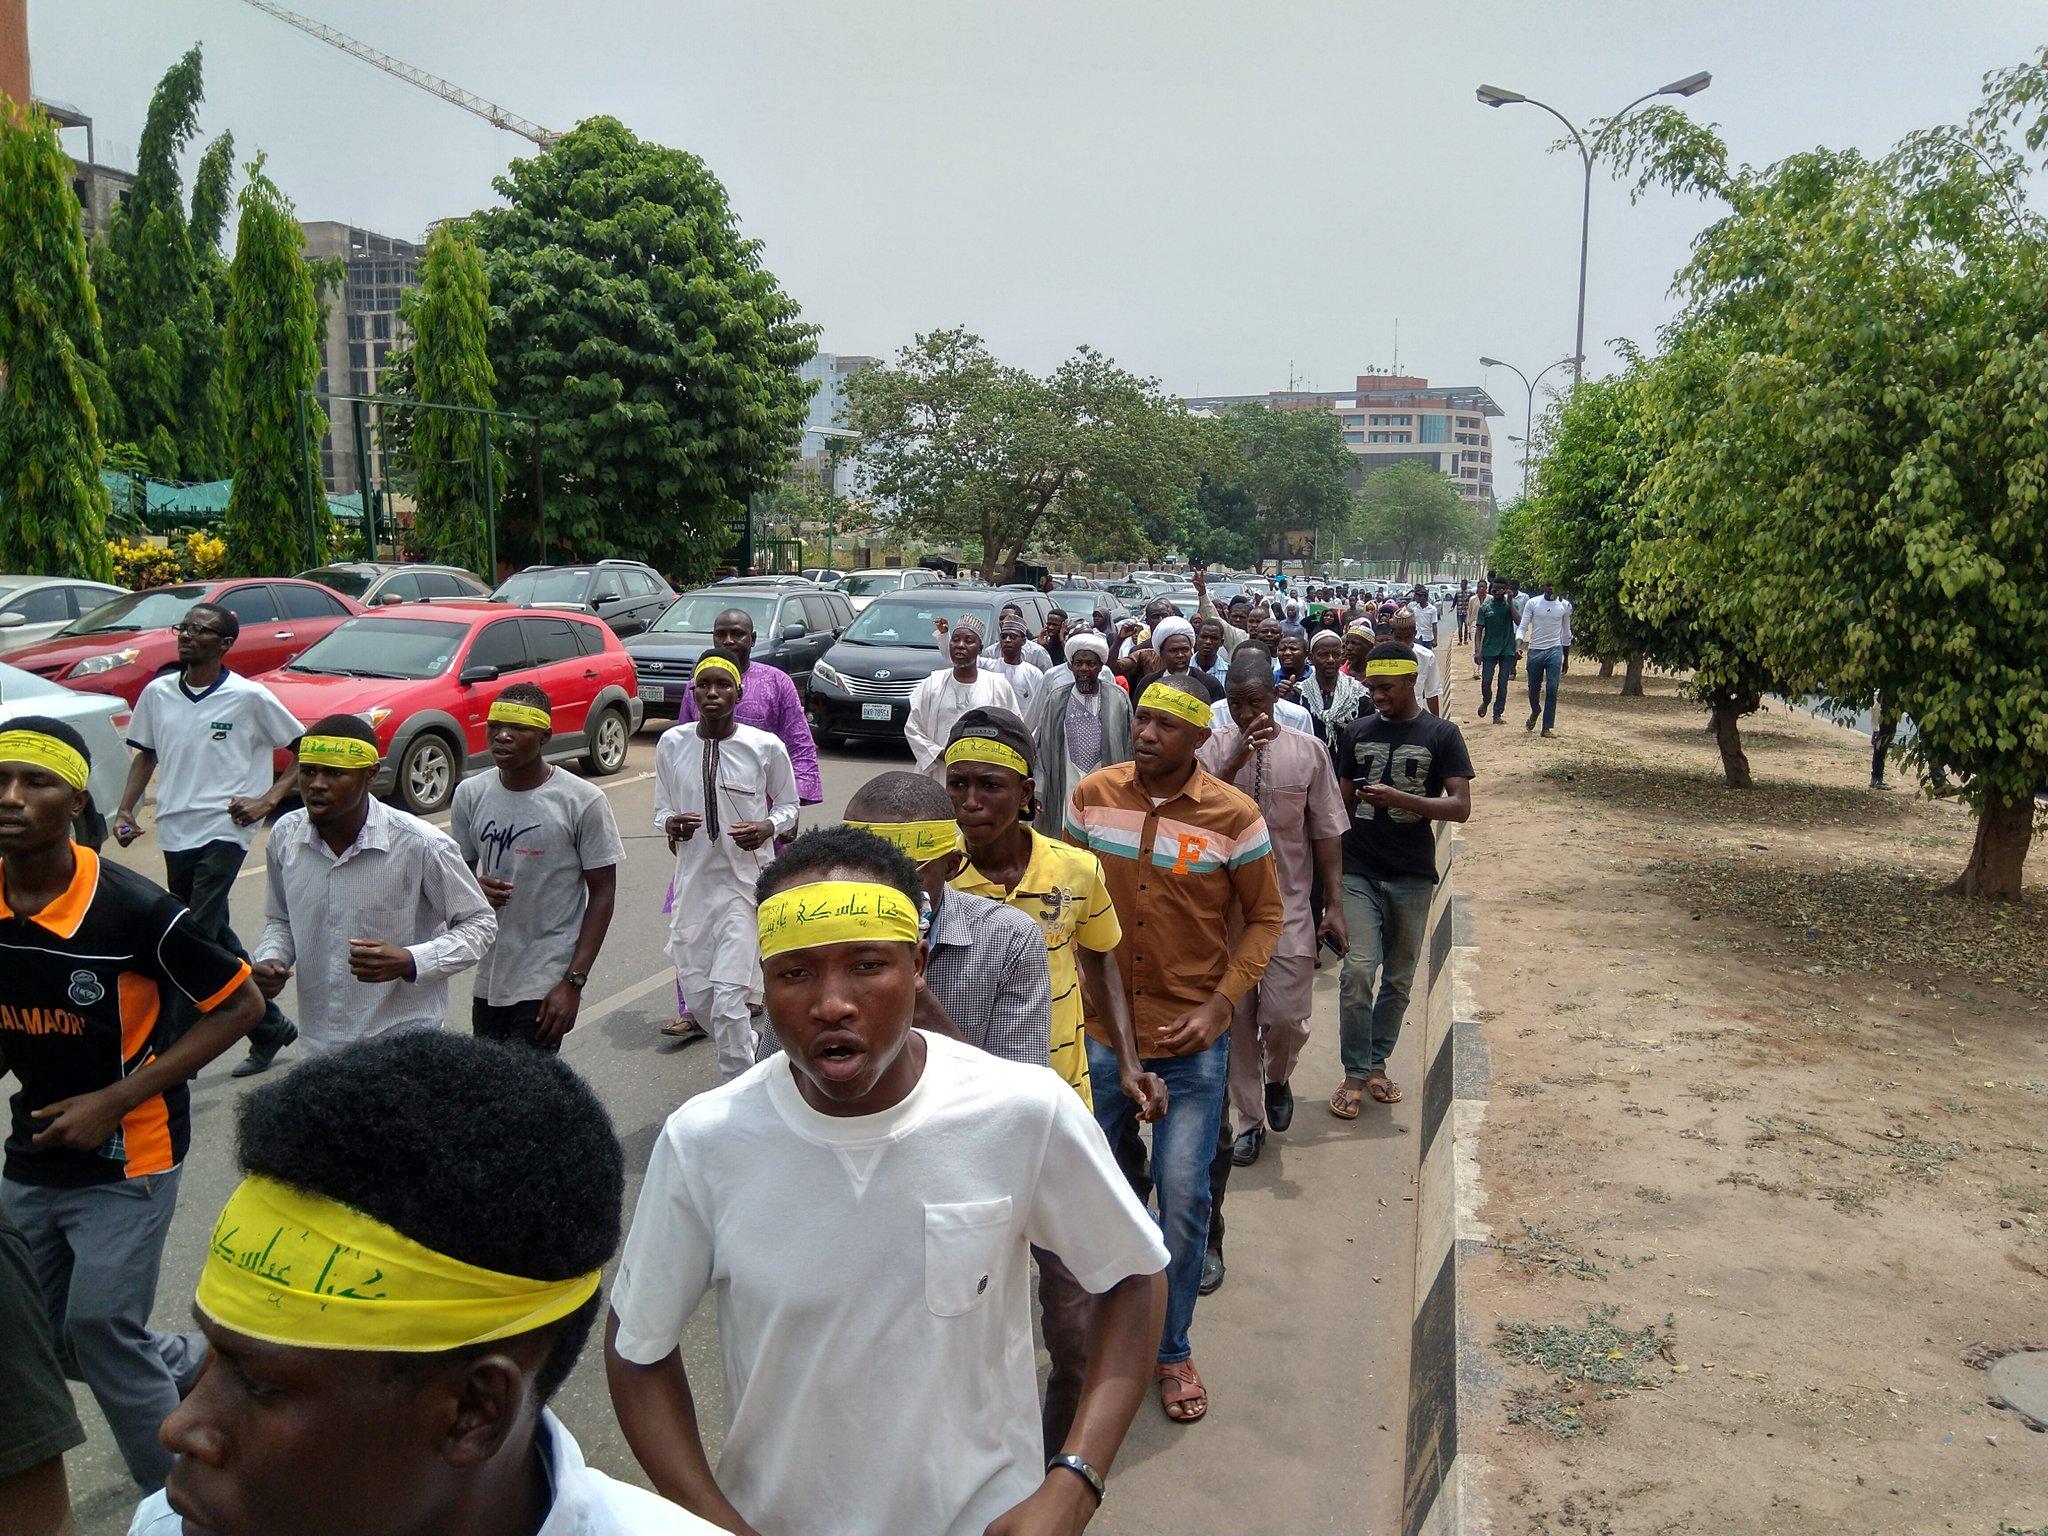 https://onlinenigeria.com/wp-content/uploads/2020/03/el-zakzaky-shiites-resumes-abuja-protest-2.jpg